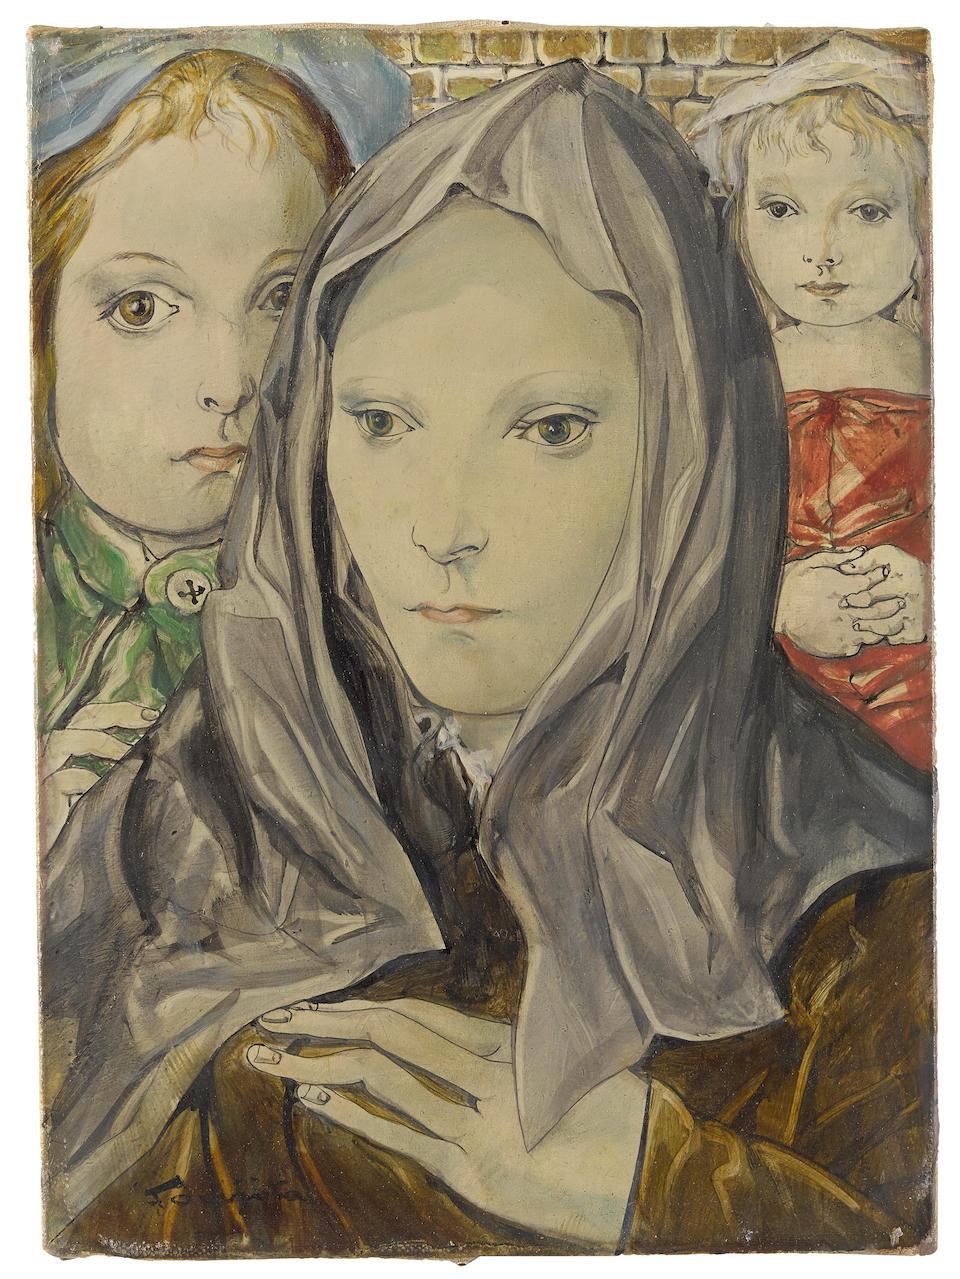 Léonard Tsuguharu Foujita (1886-1968) La femme au voile 8 3/4 x 6 3/8 in (22.3 x 16.2 cm) (Painted in 1954)